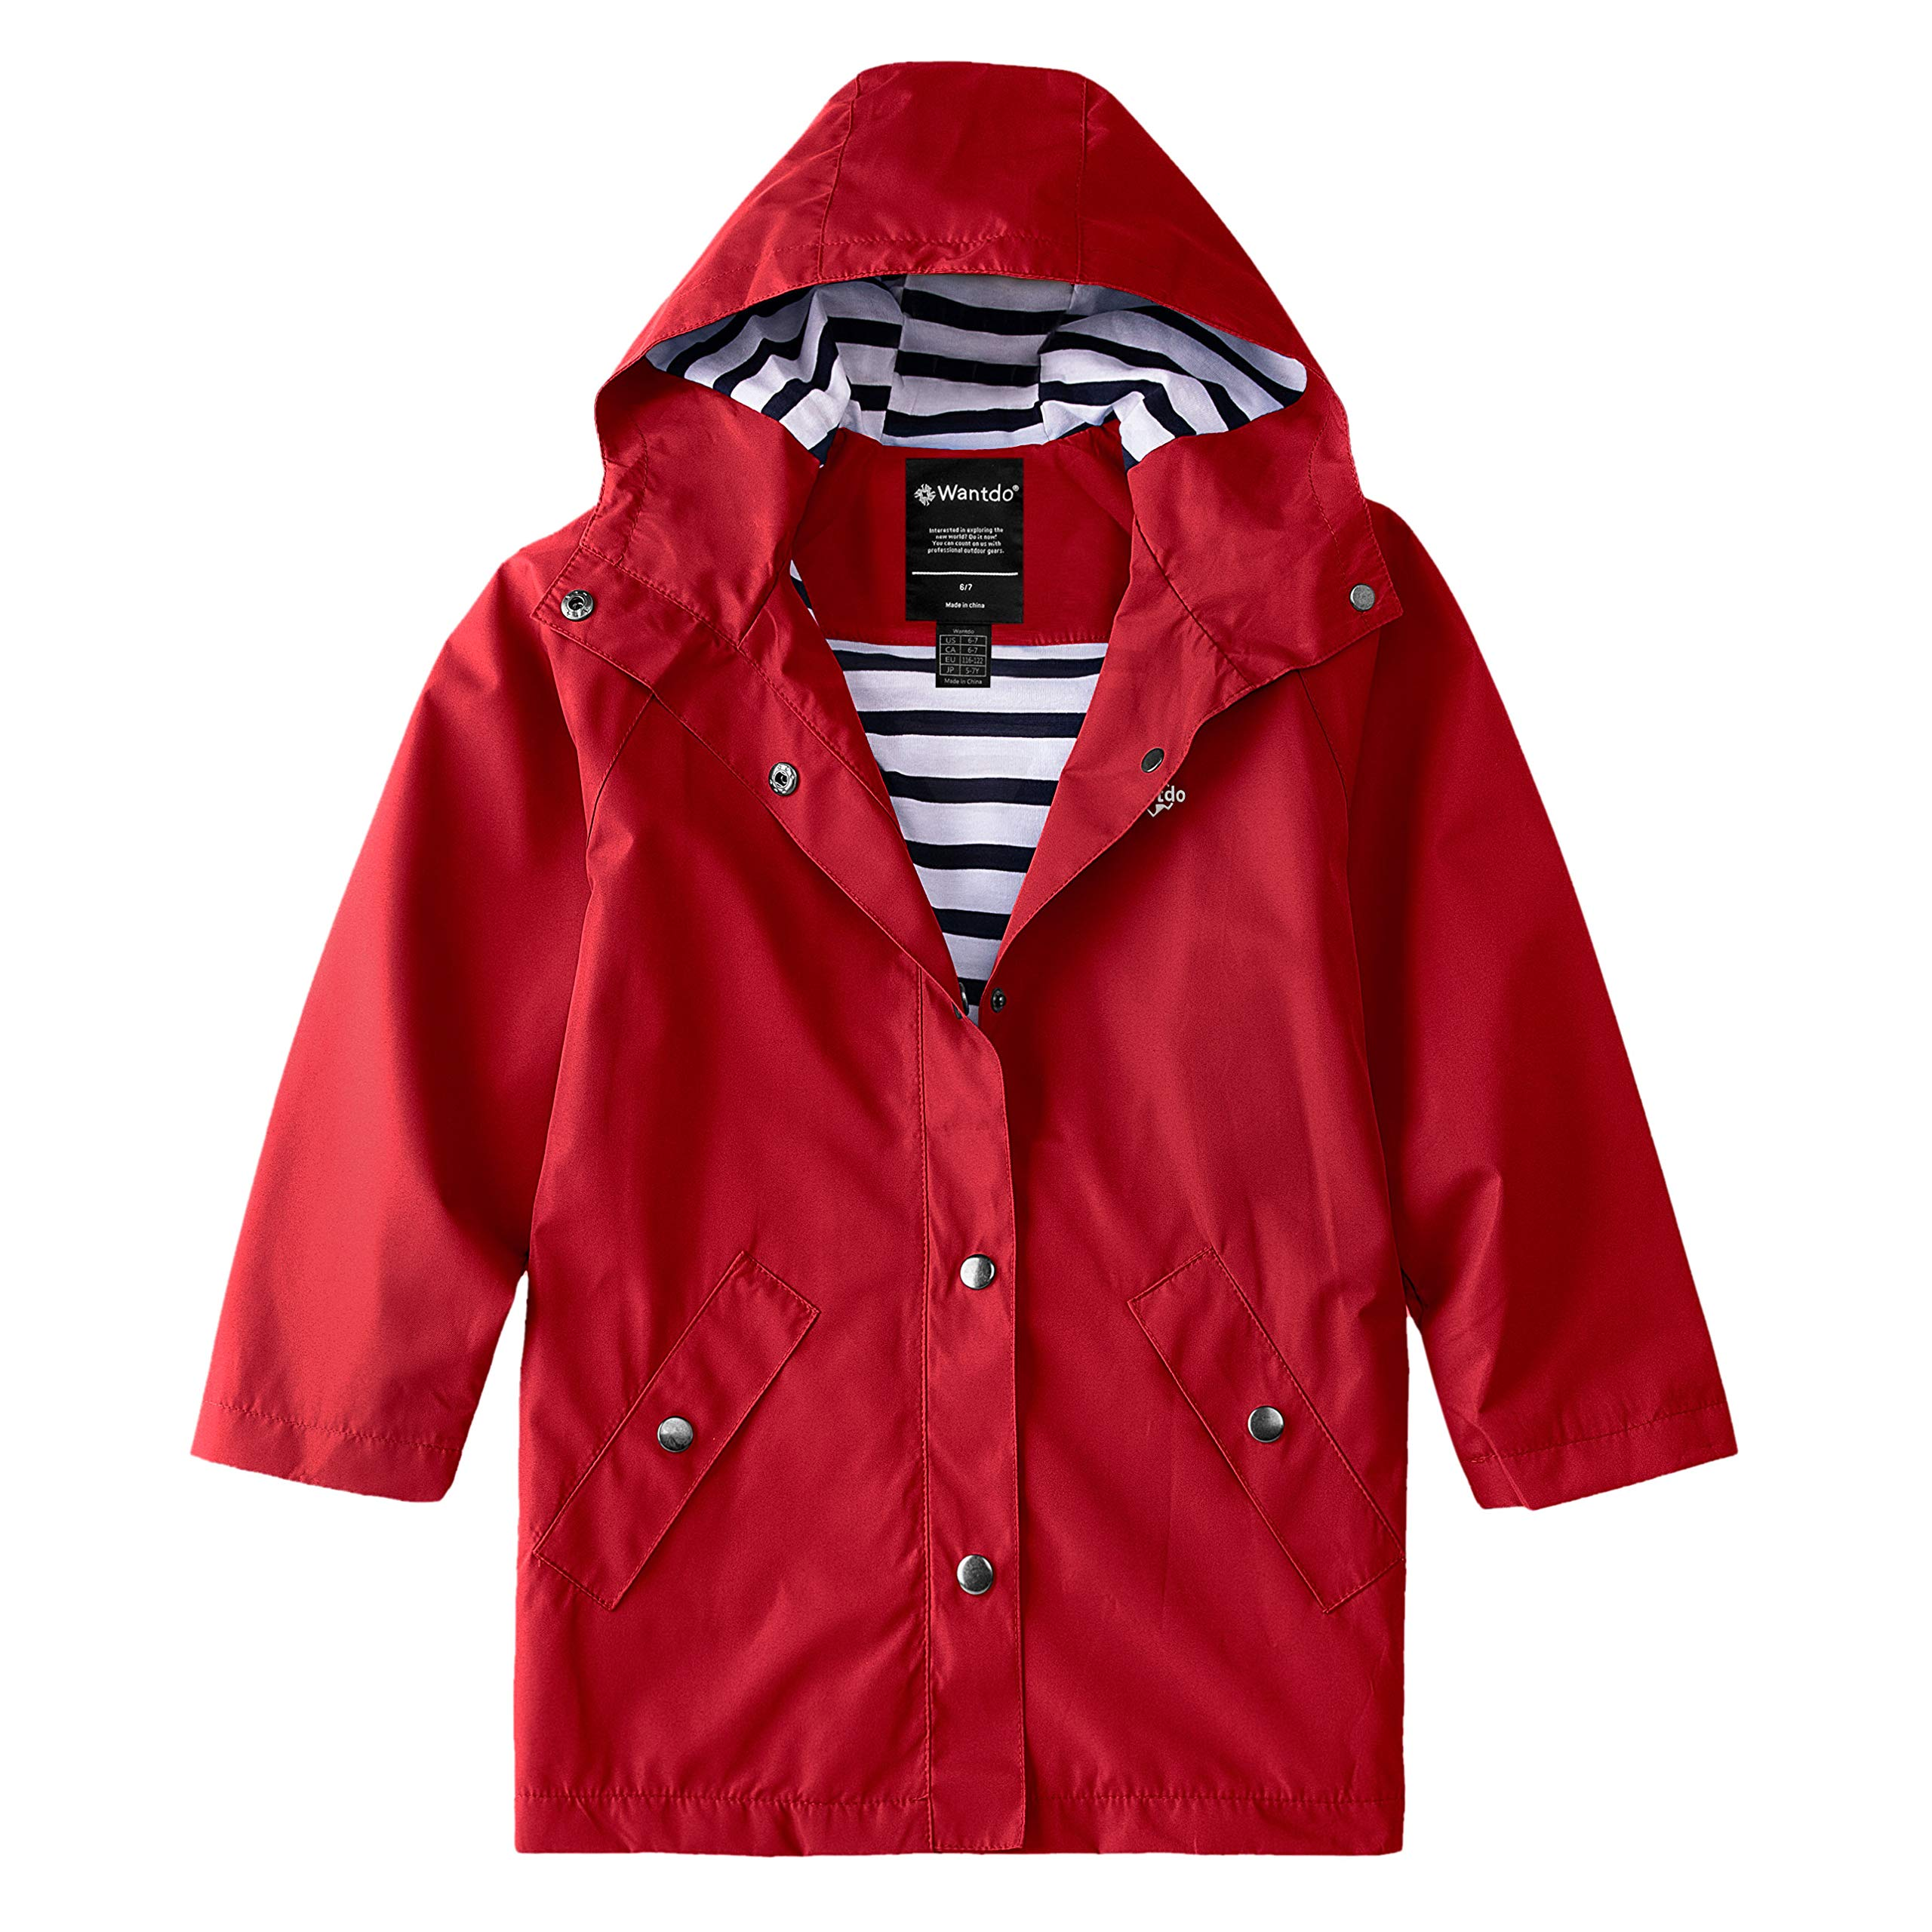 Wantdo Boys Girls Water Resistant Long Rain Jacket Hooded Raincoat Red 6/7 by Wantdo